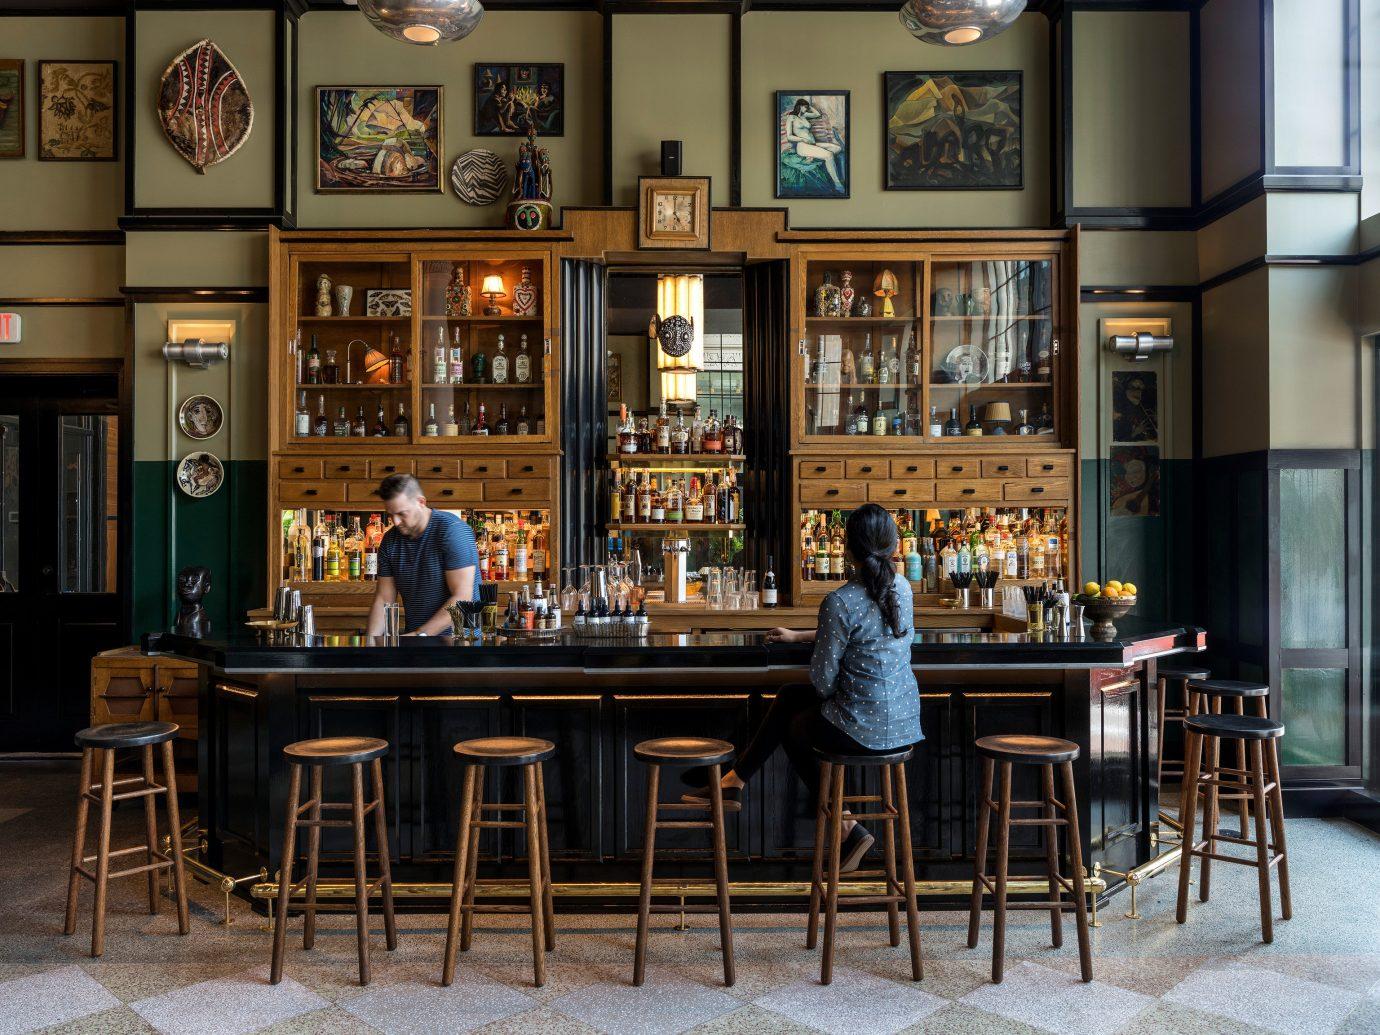 Hotels Trip Ideas indoor floor chair Bar restaurant café interior design tavern coffeehouse